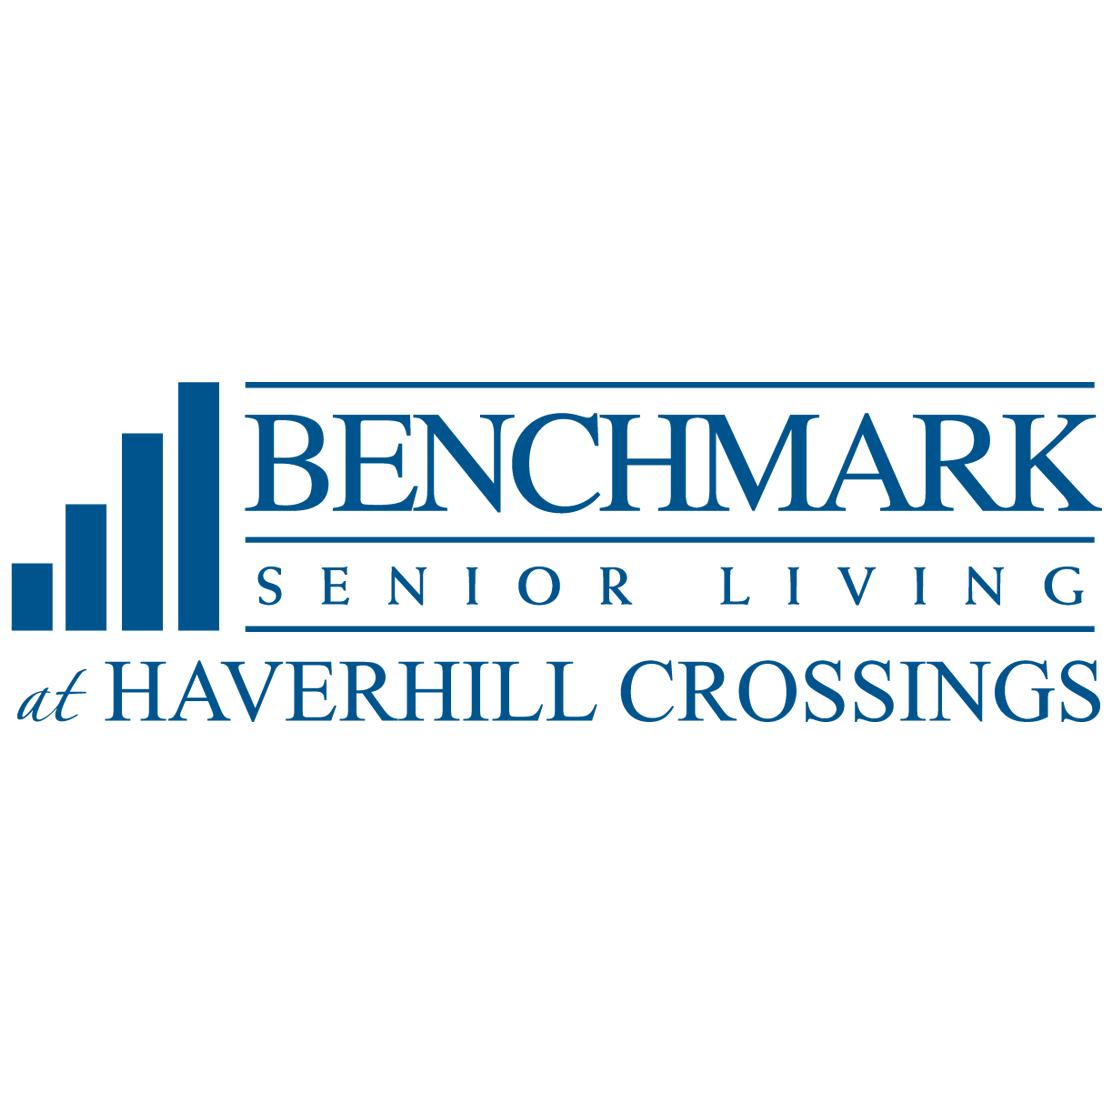 Benchmark Senior Living at Haverhill Crossings image 5